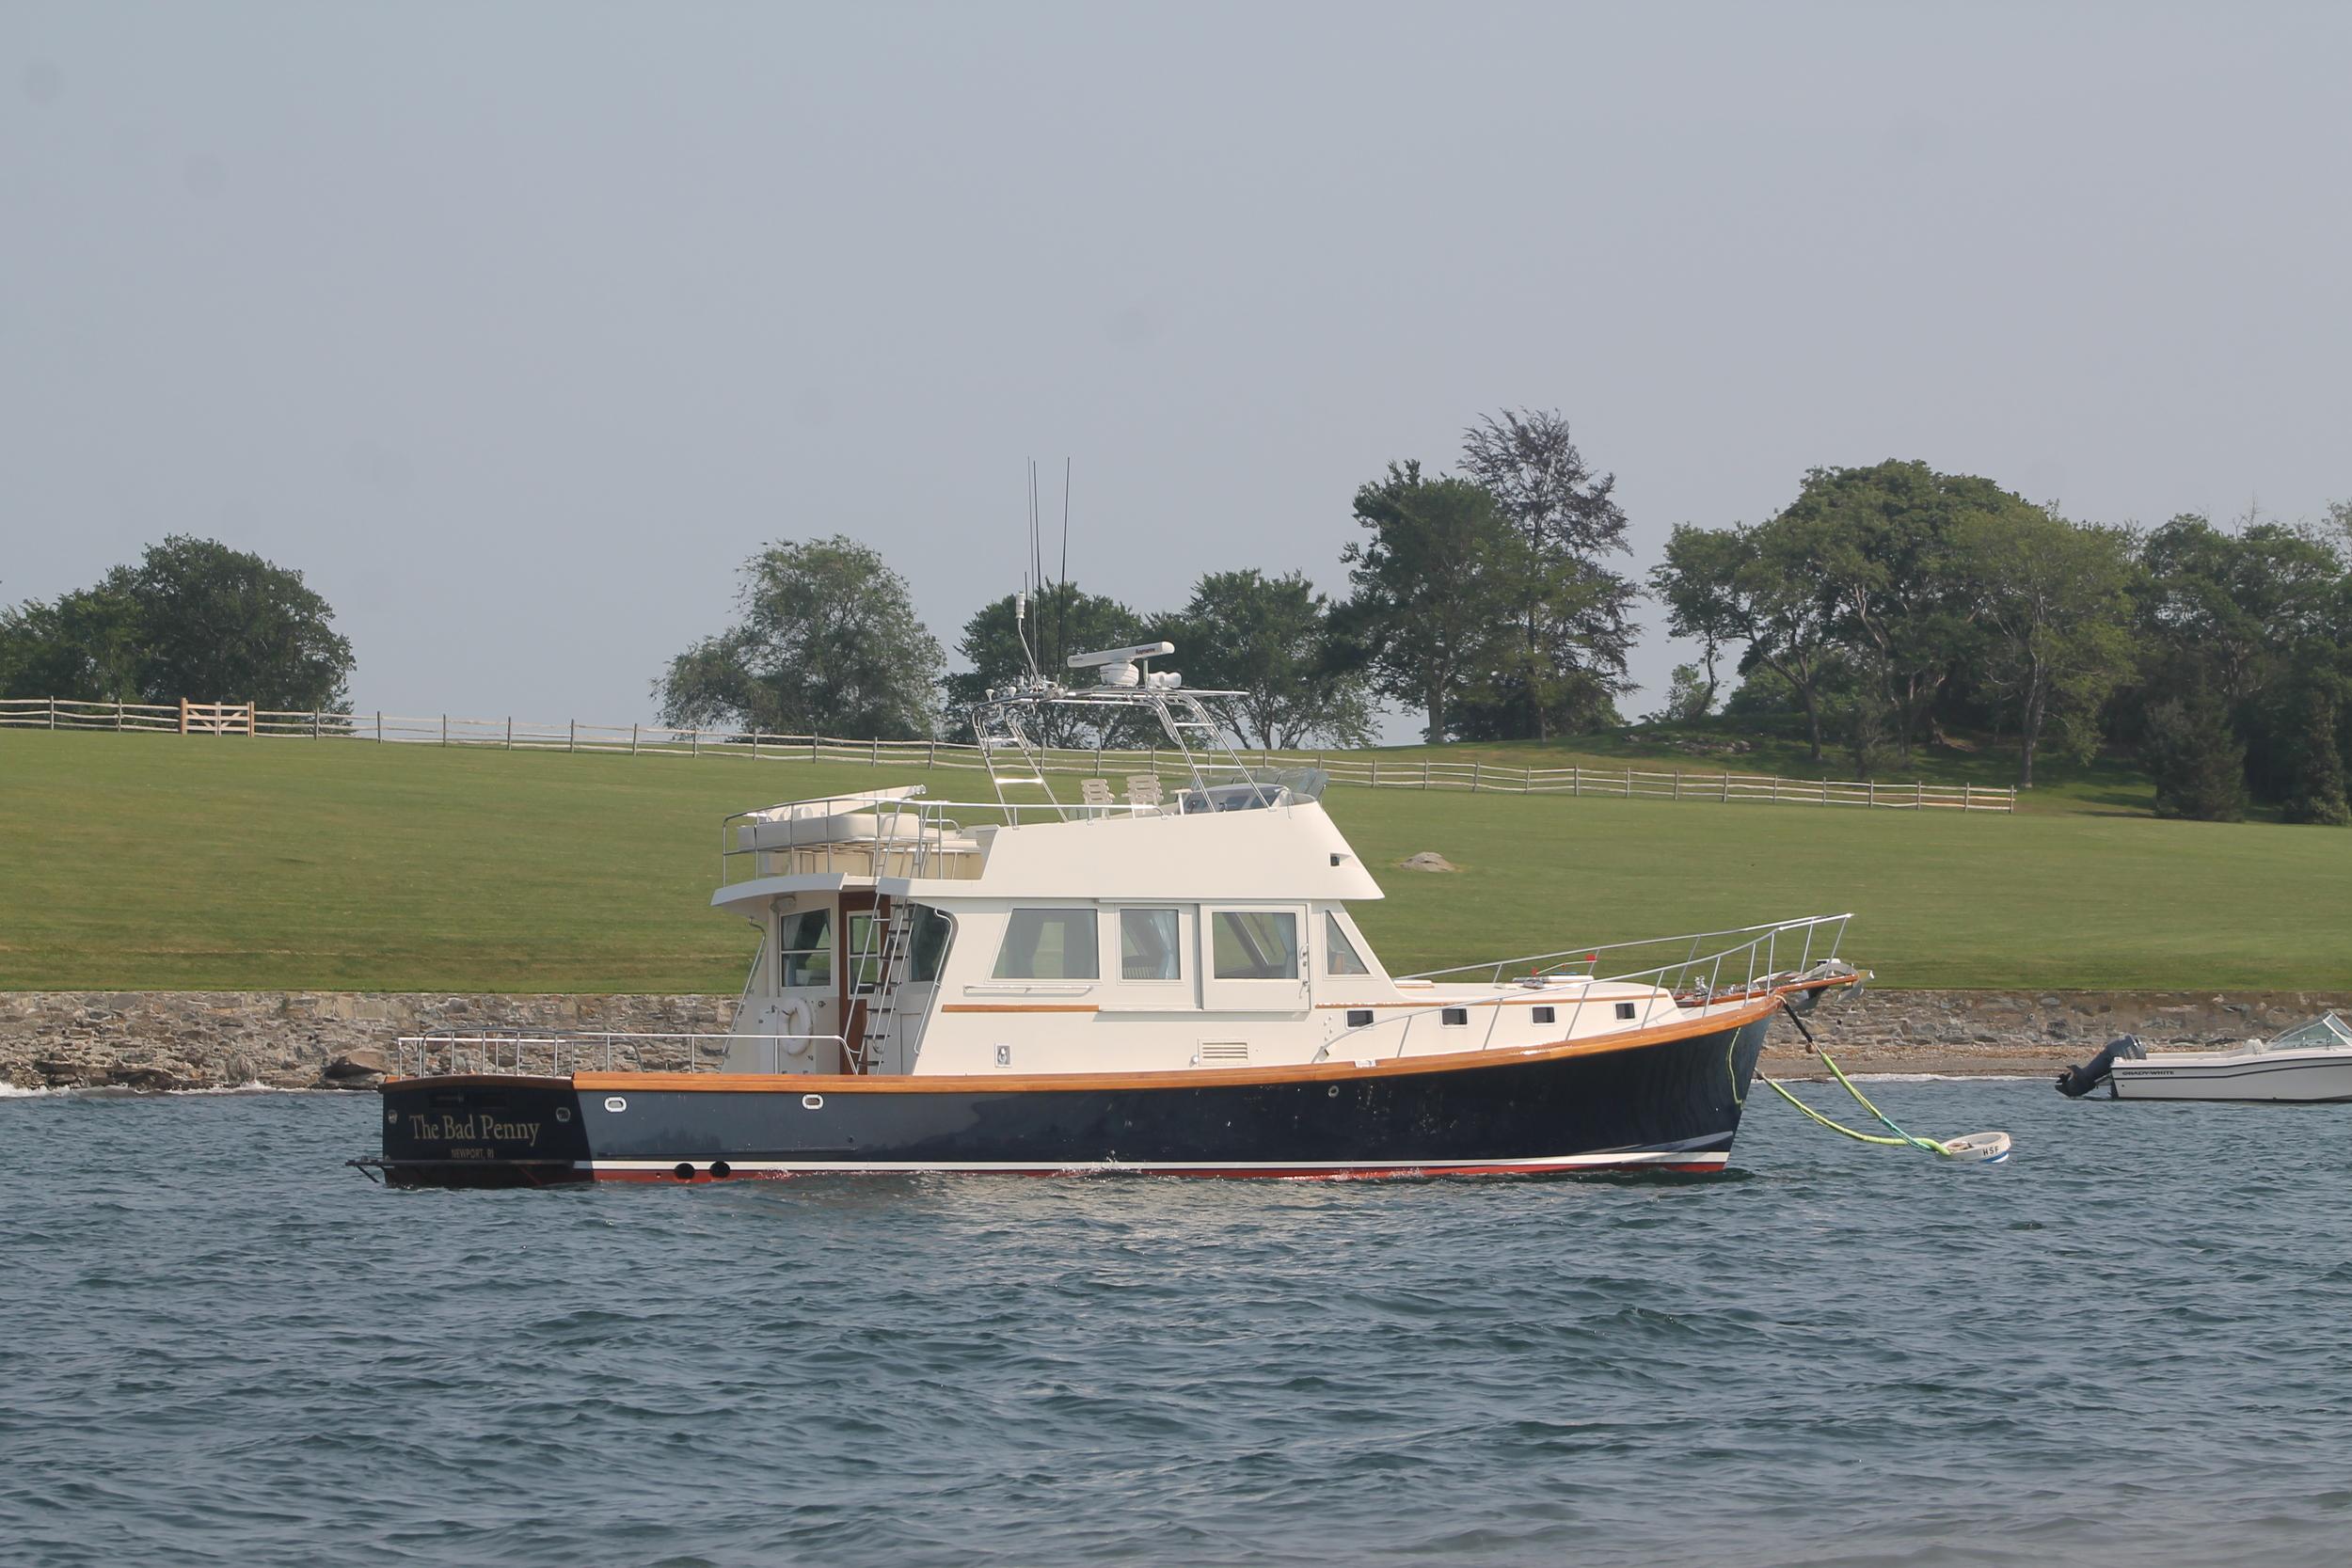 Boat anchored atHammersmith Farm